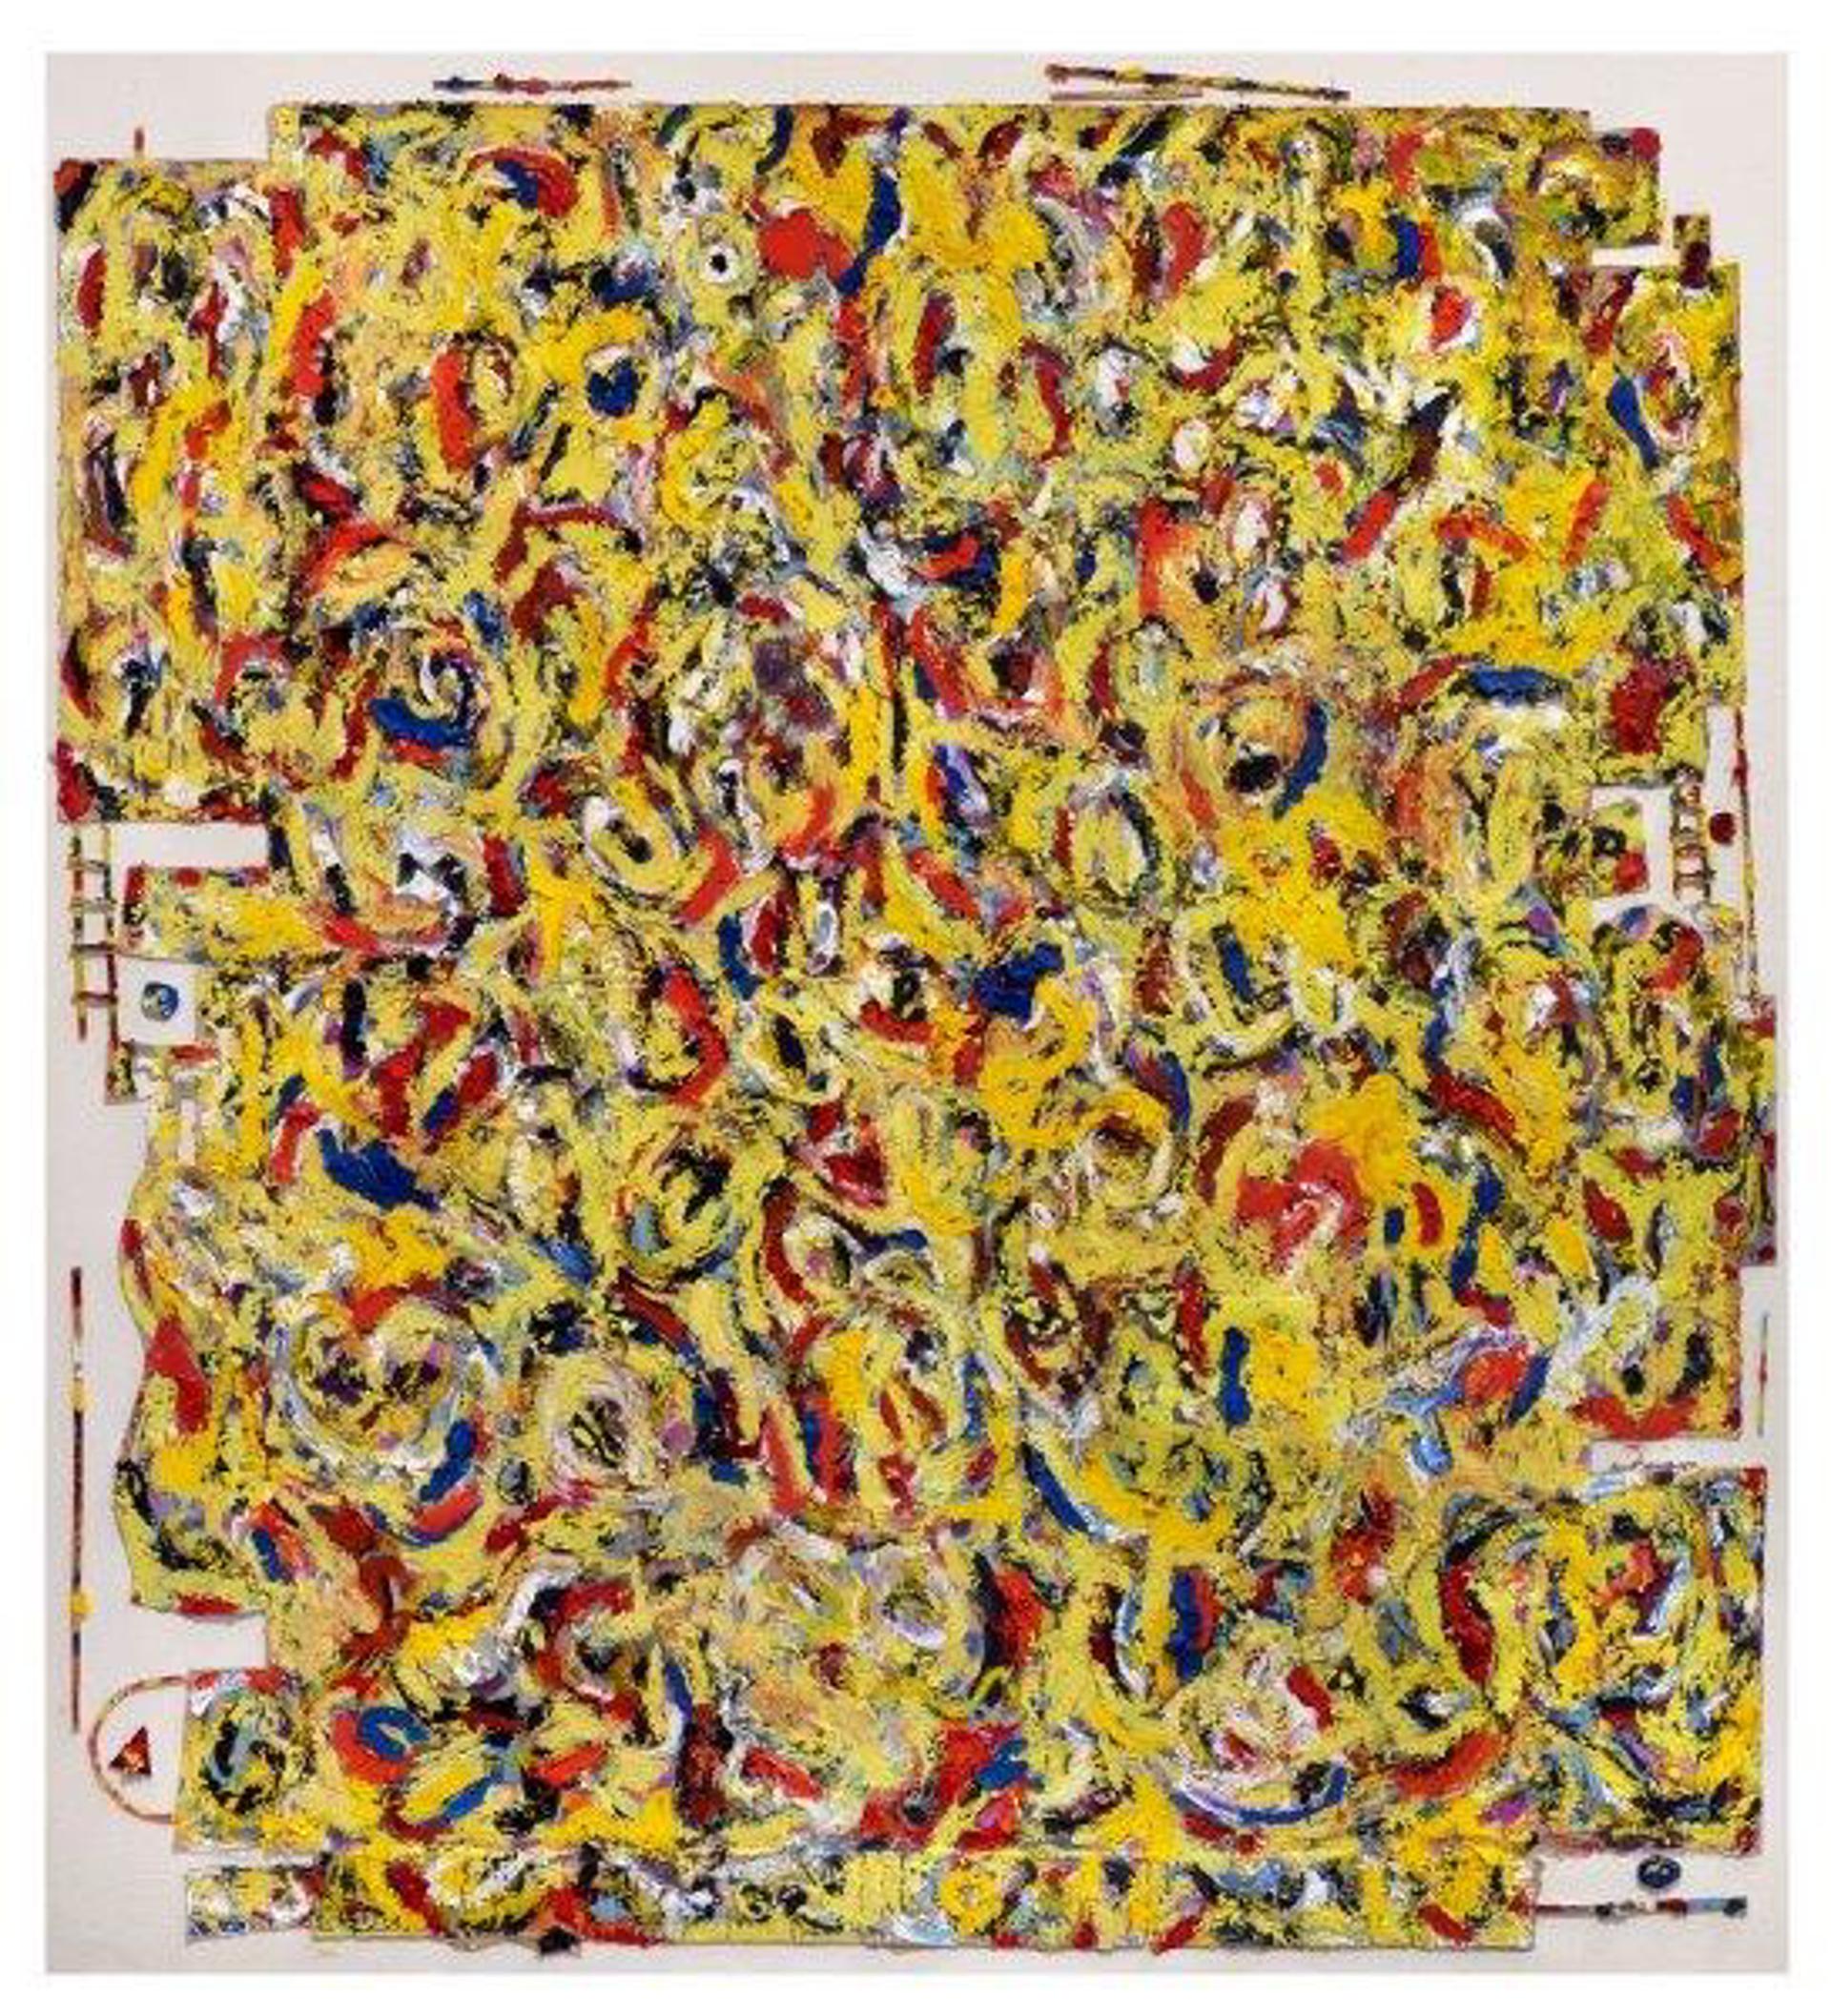 Sirigu Yellow Passion by Floyd Newsum